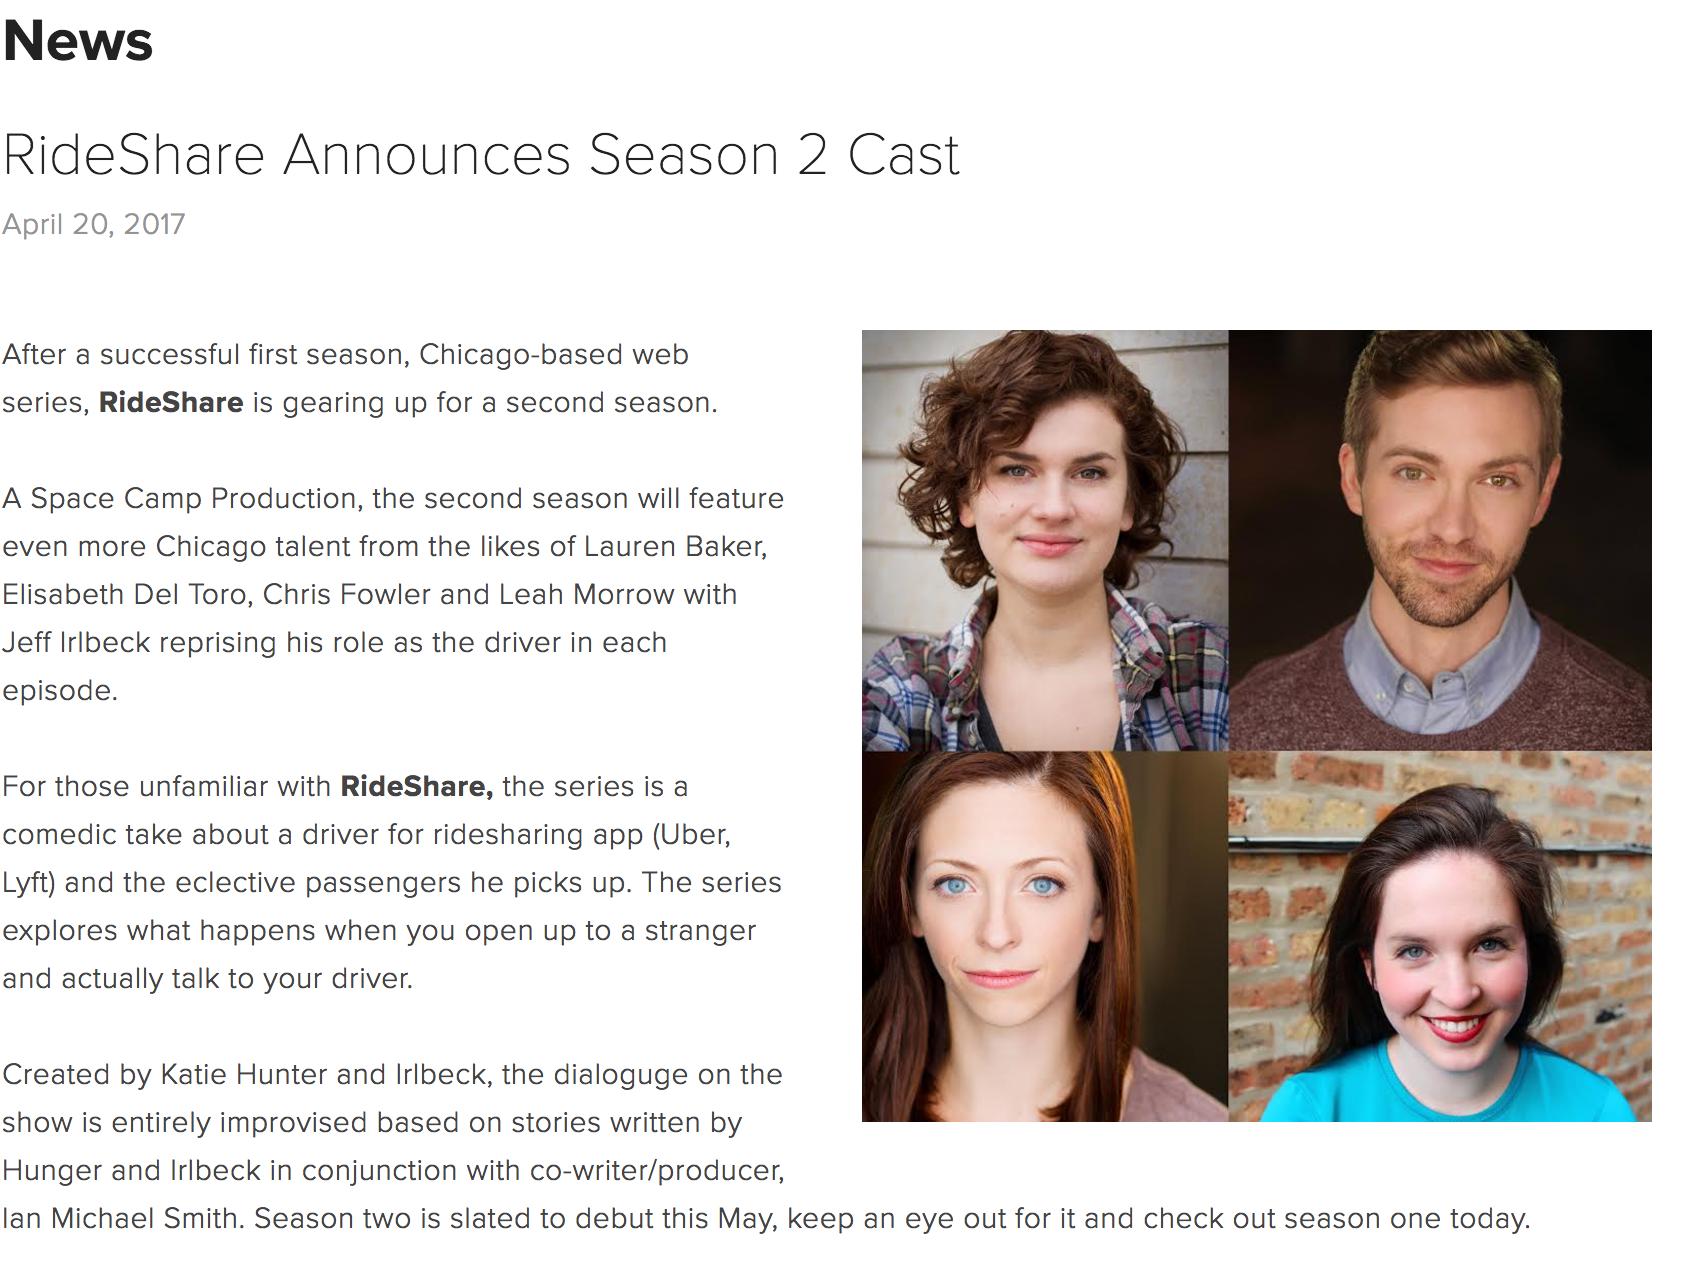 RideShare Season 2 Cast Announced